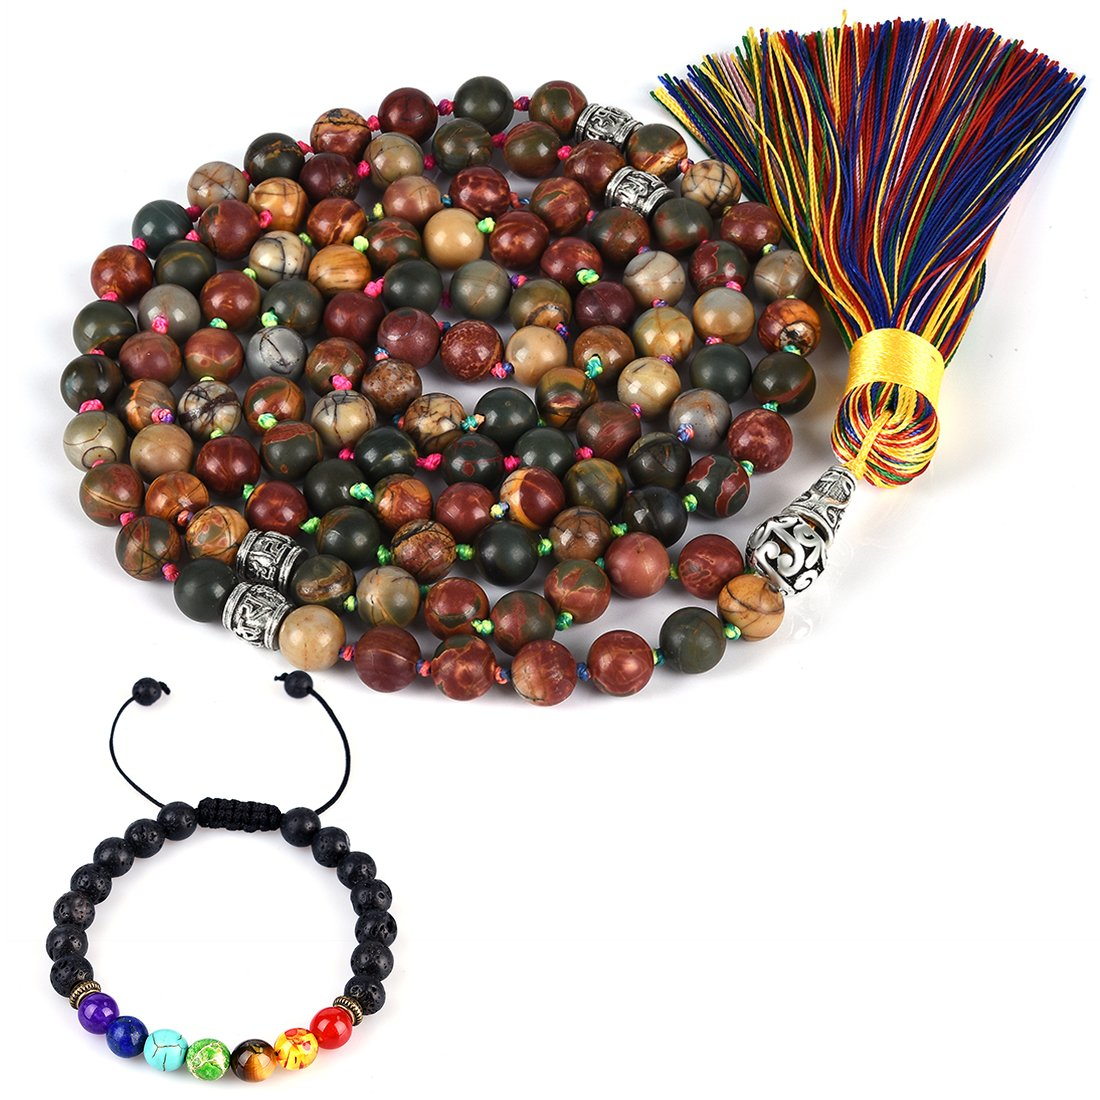 CAT EYE JEWELS 8mm Mala Beads Necklace Yoga Meditation 108 Hand Knotted Picasso Jasper Japa Mala Buddhist Prayer Beads Tassel Necklace Healing Lava Rock Beads Diffuser Bracelet